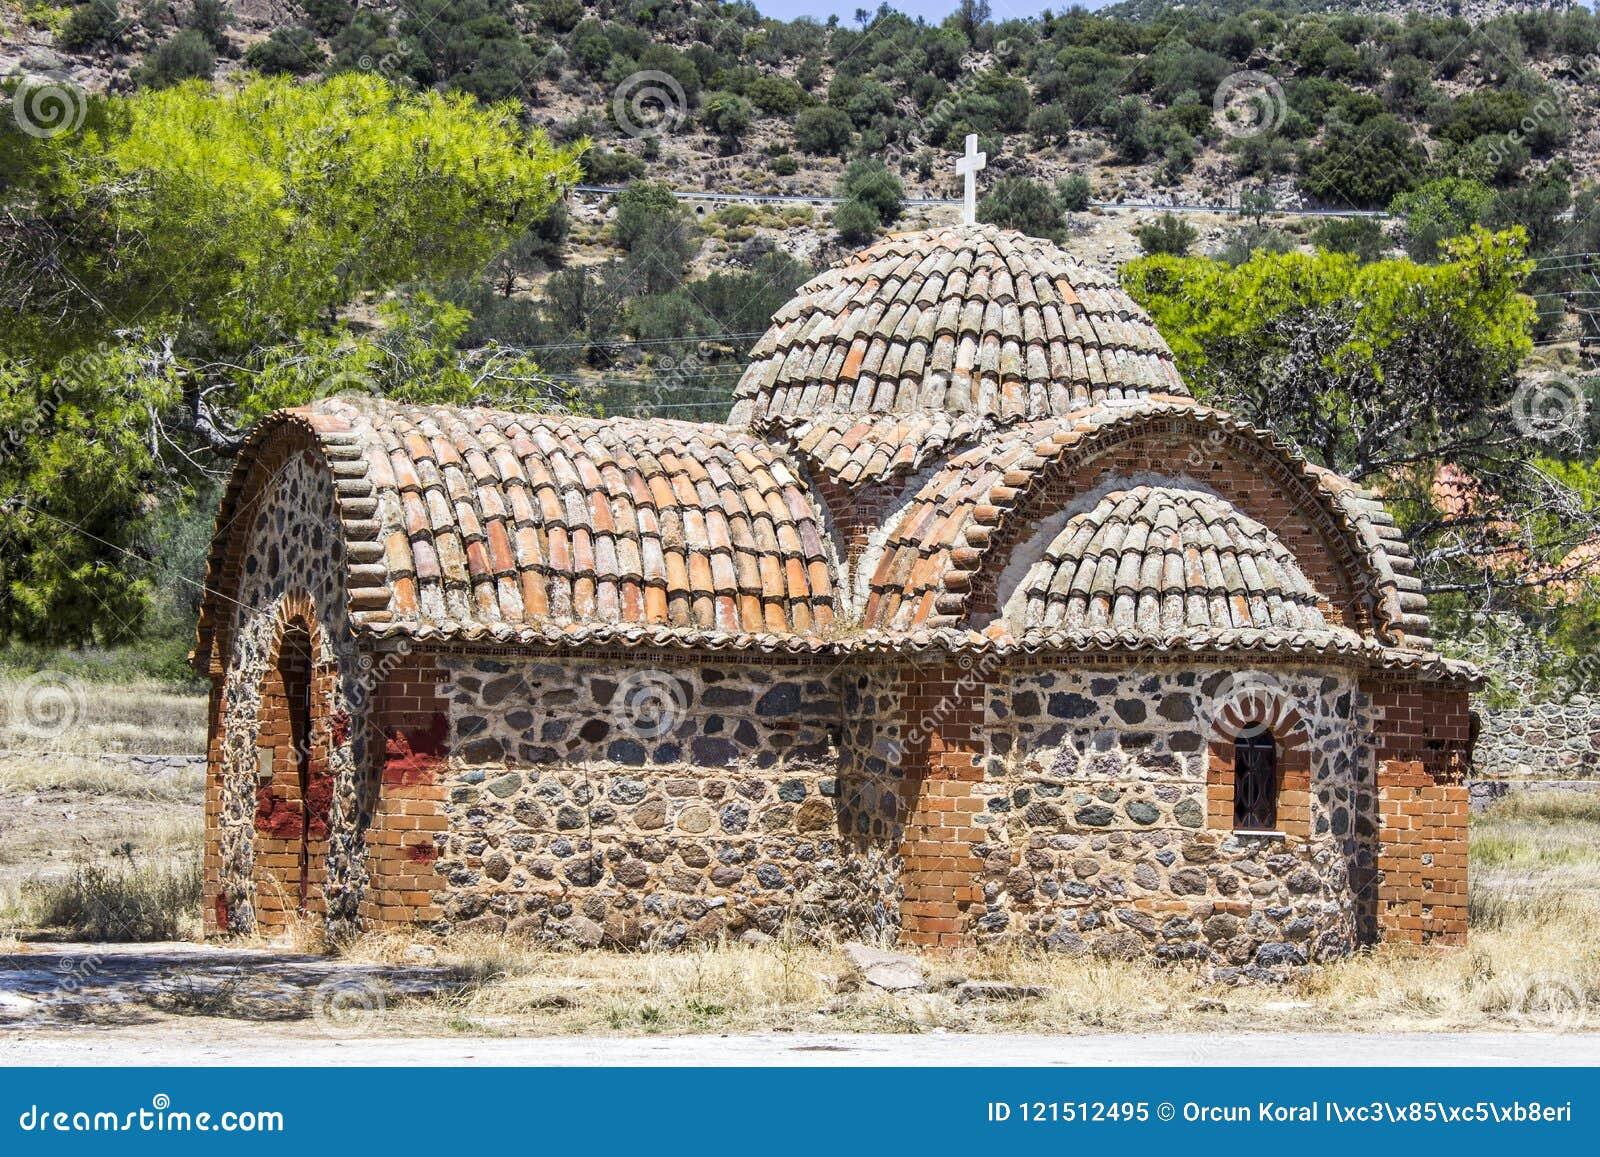 Het christelijke metselwerk builded de herinneringsbouw voor priesters in Lemonas in Lesvos